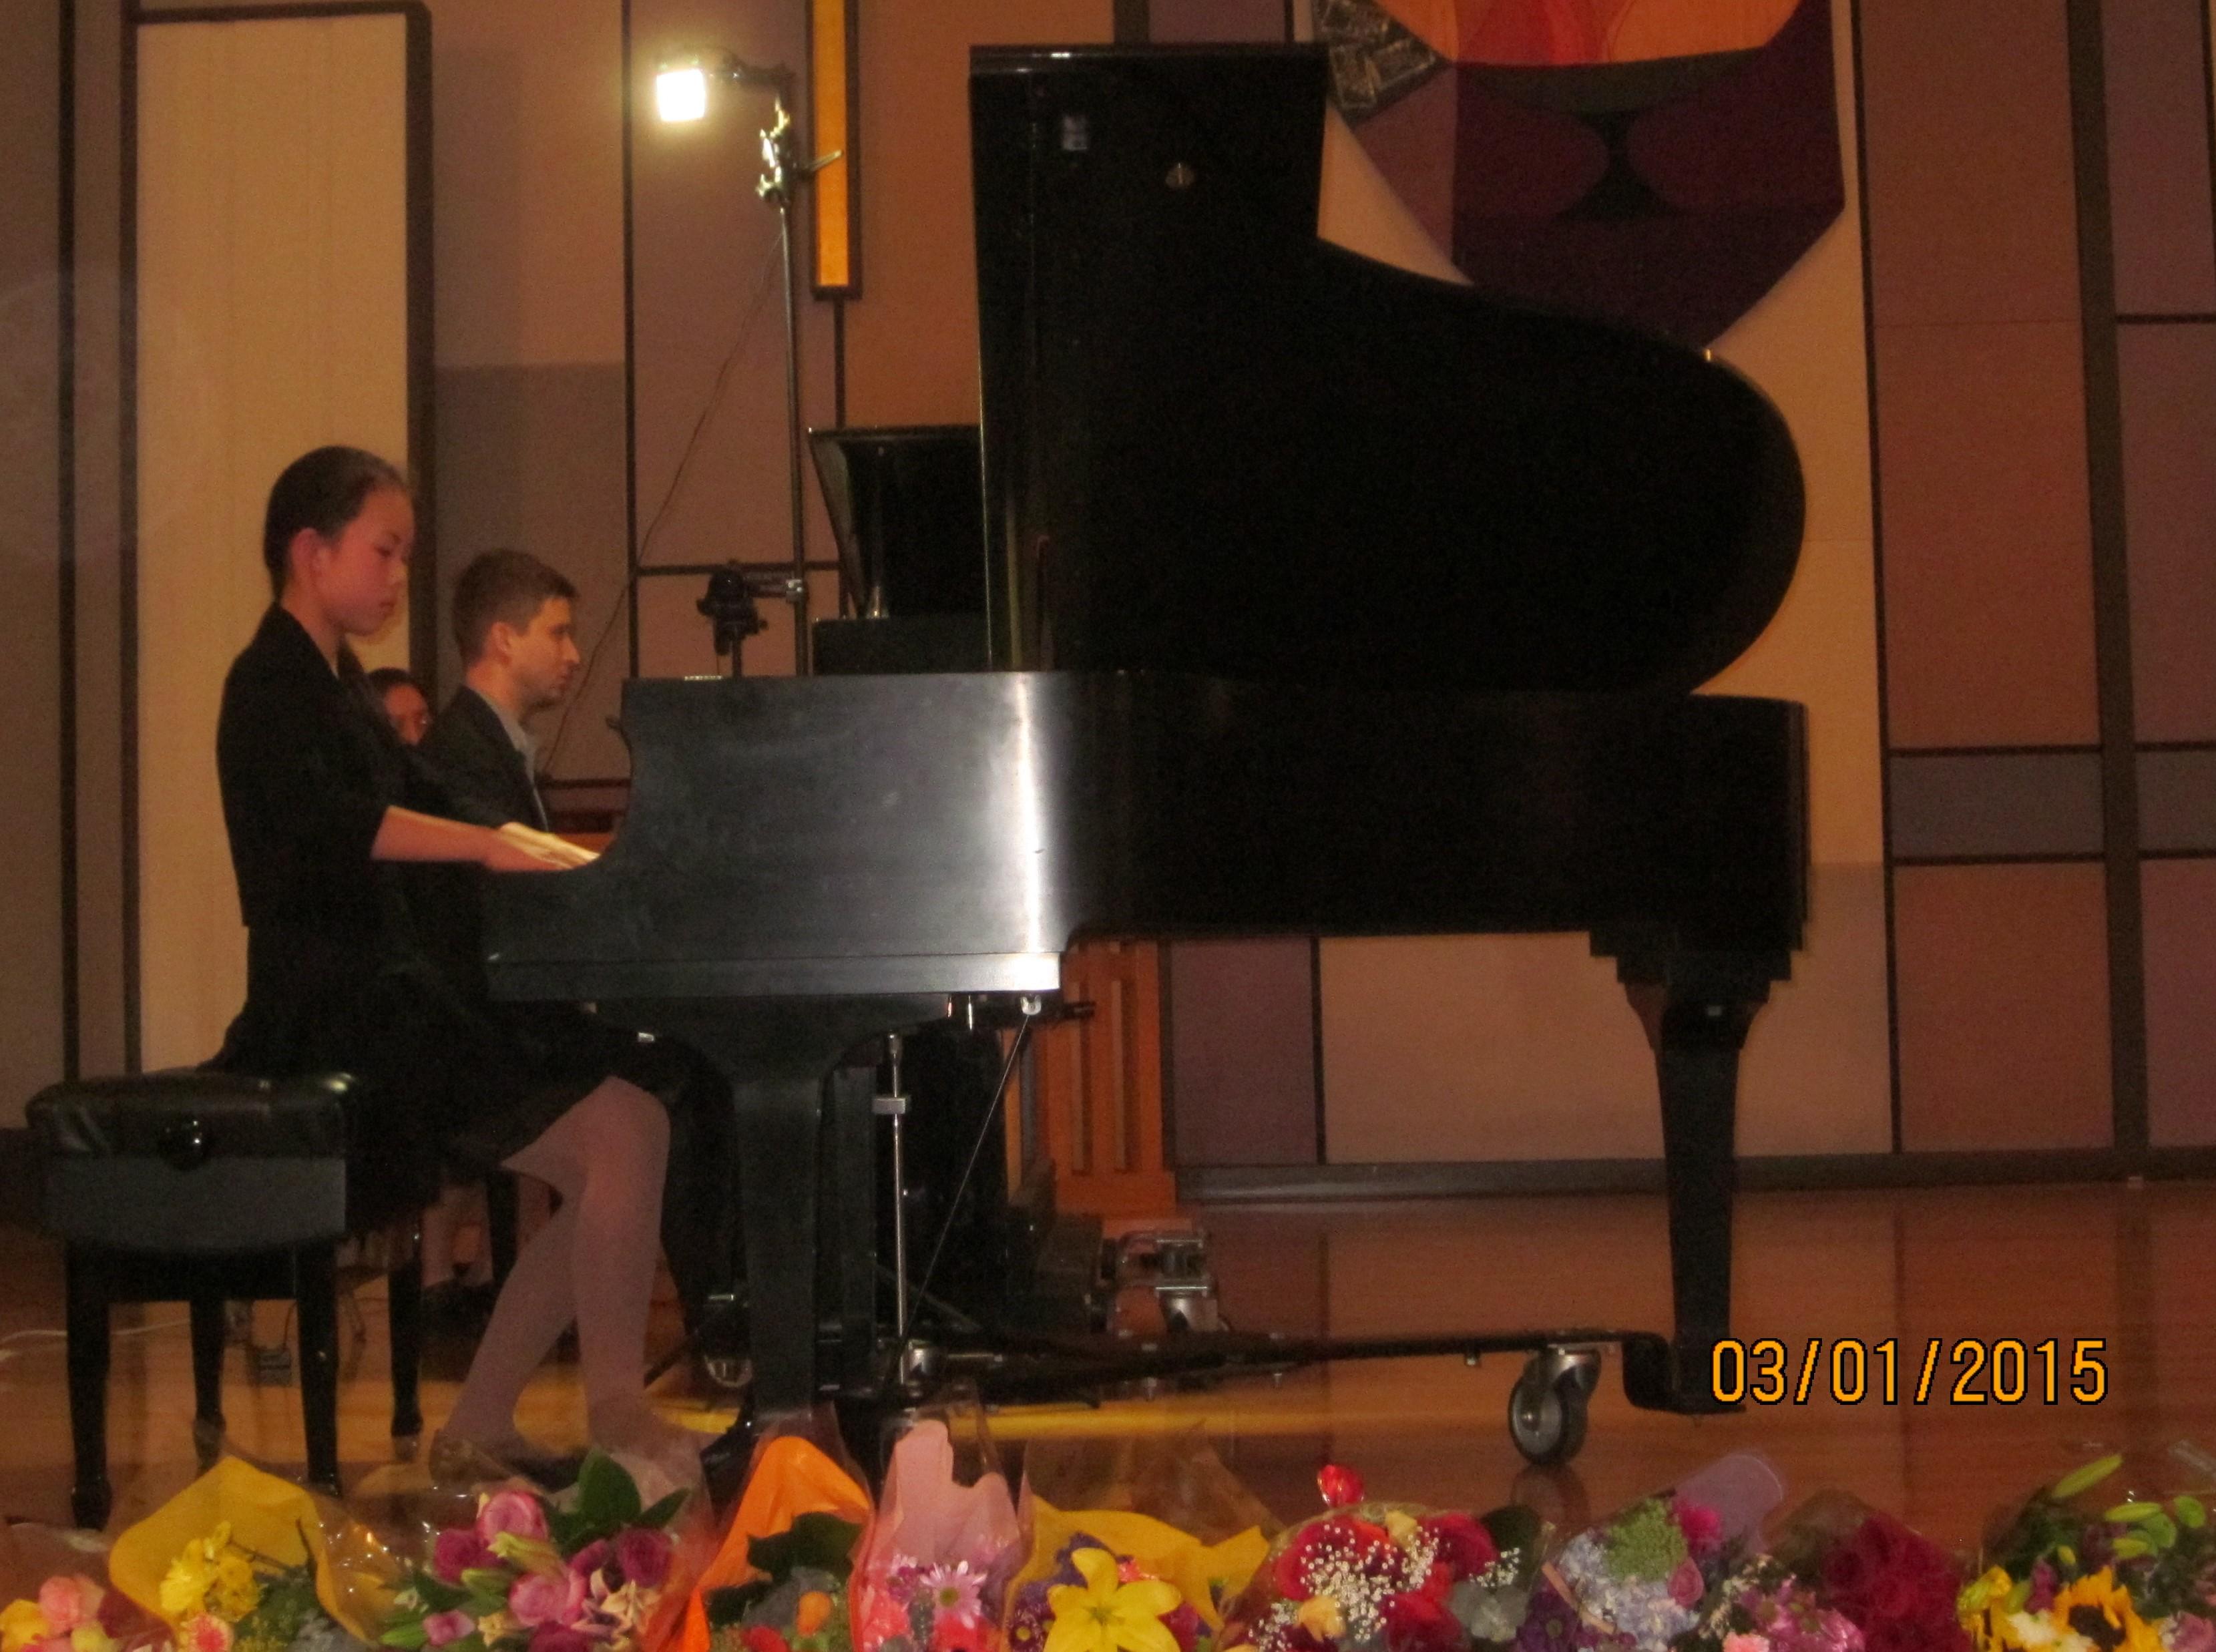 concerto-performance-at-pma-winner-recital_28418119525_o